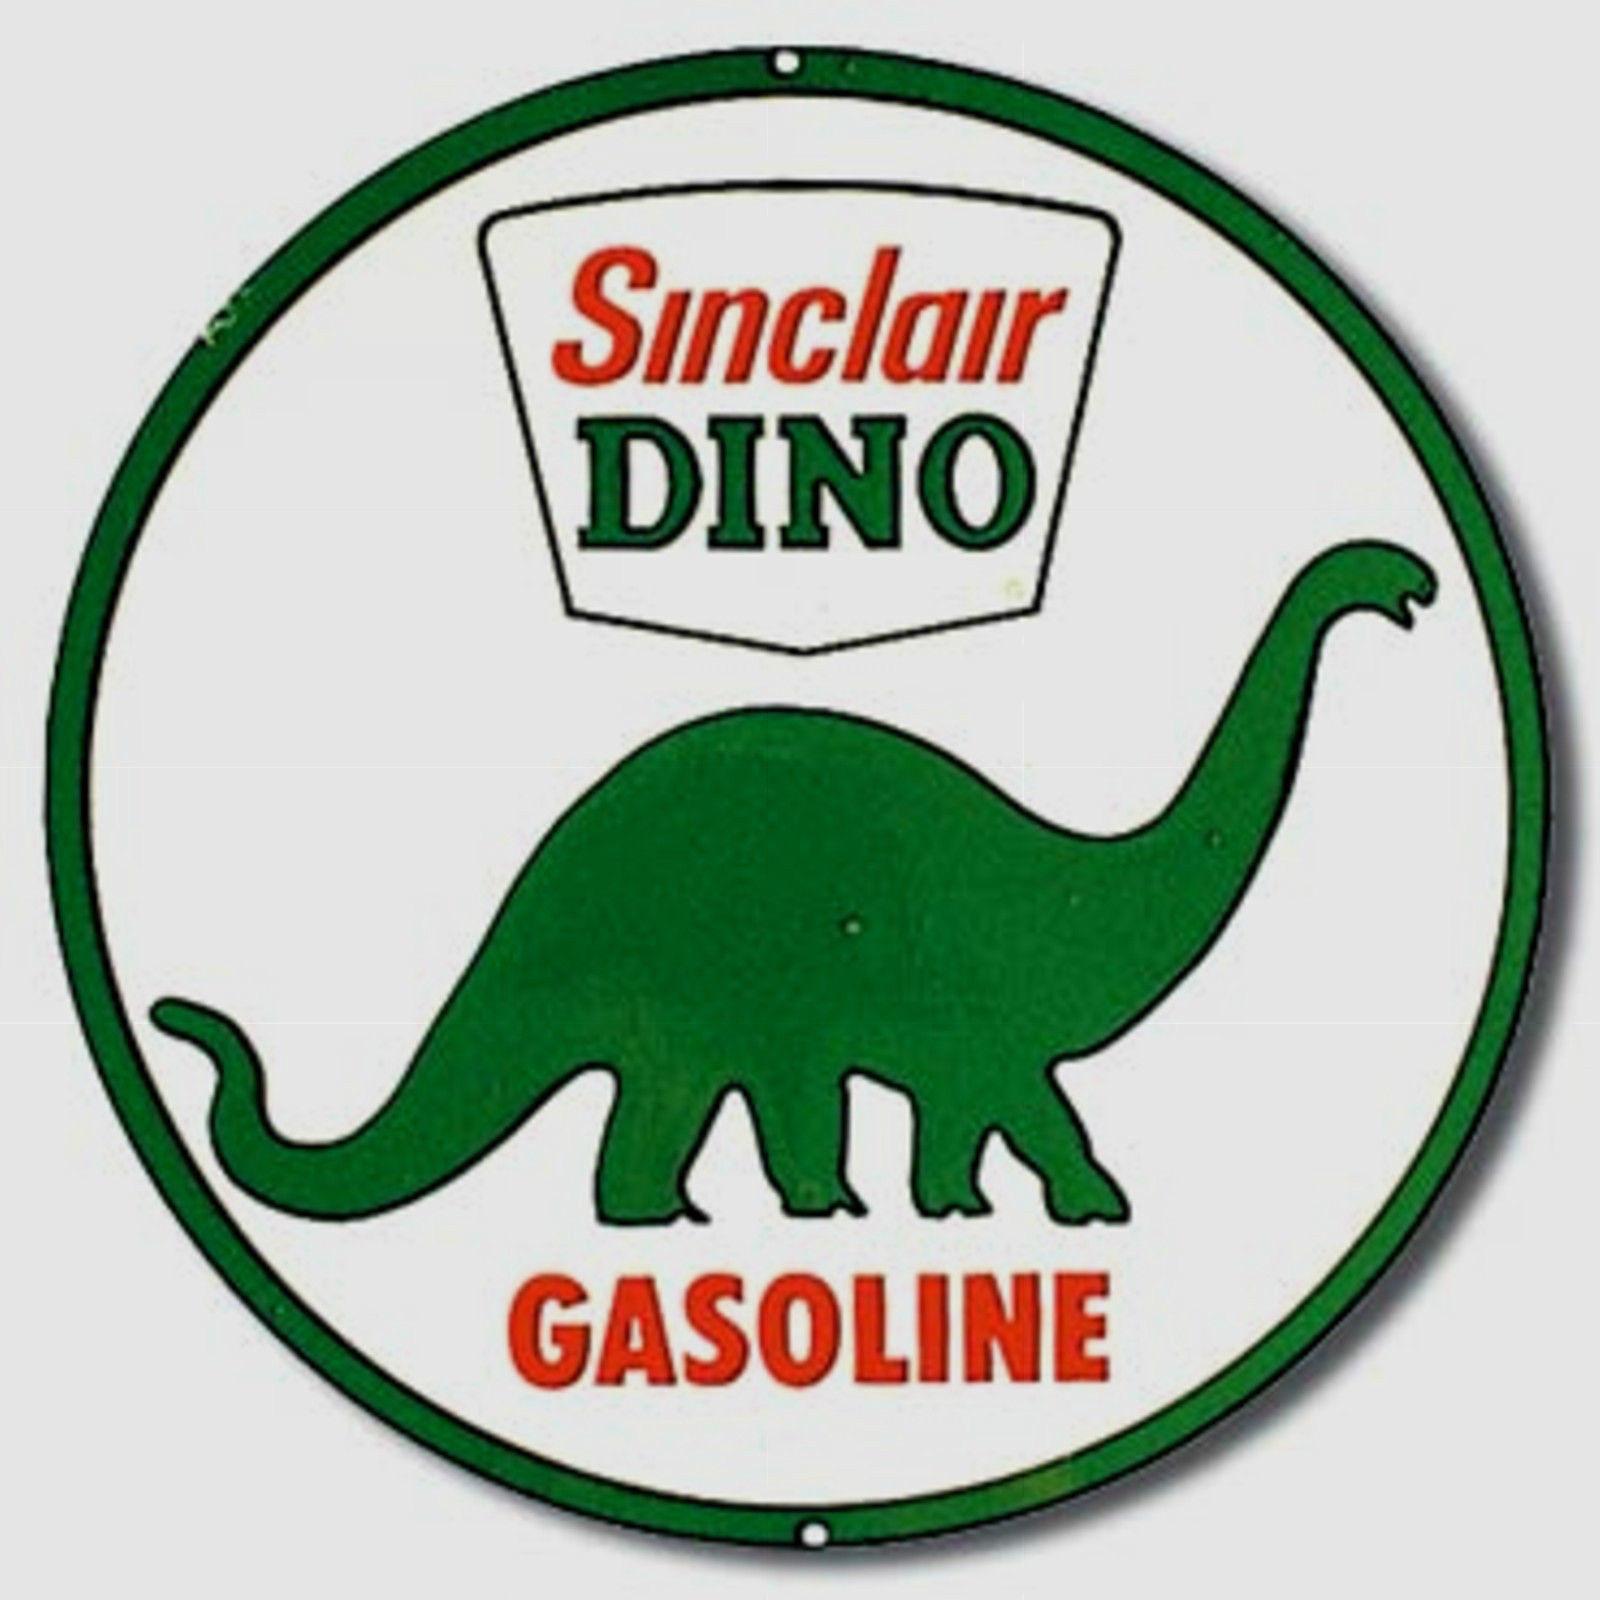 Sinclair Dino Oil Gas Metal Sign Tin New Vintage Style USA #207